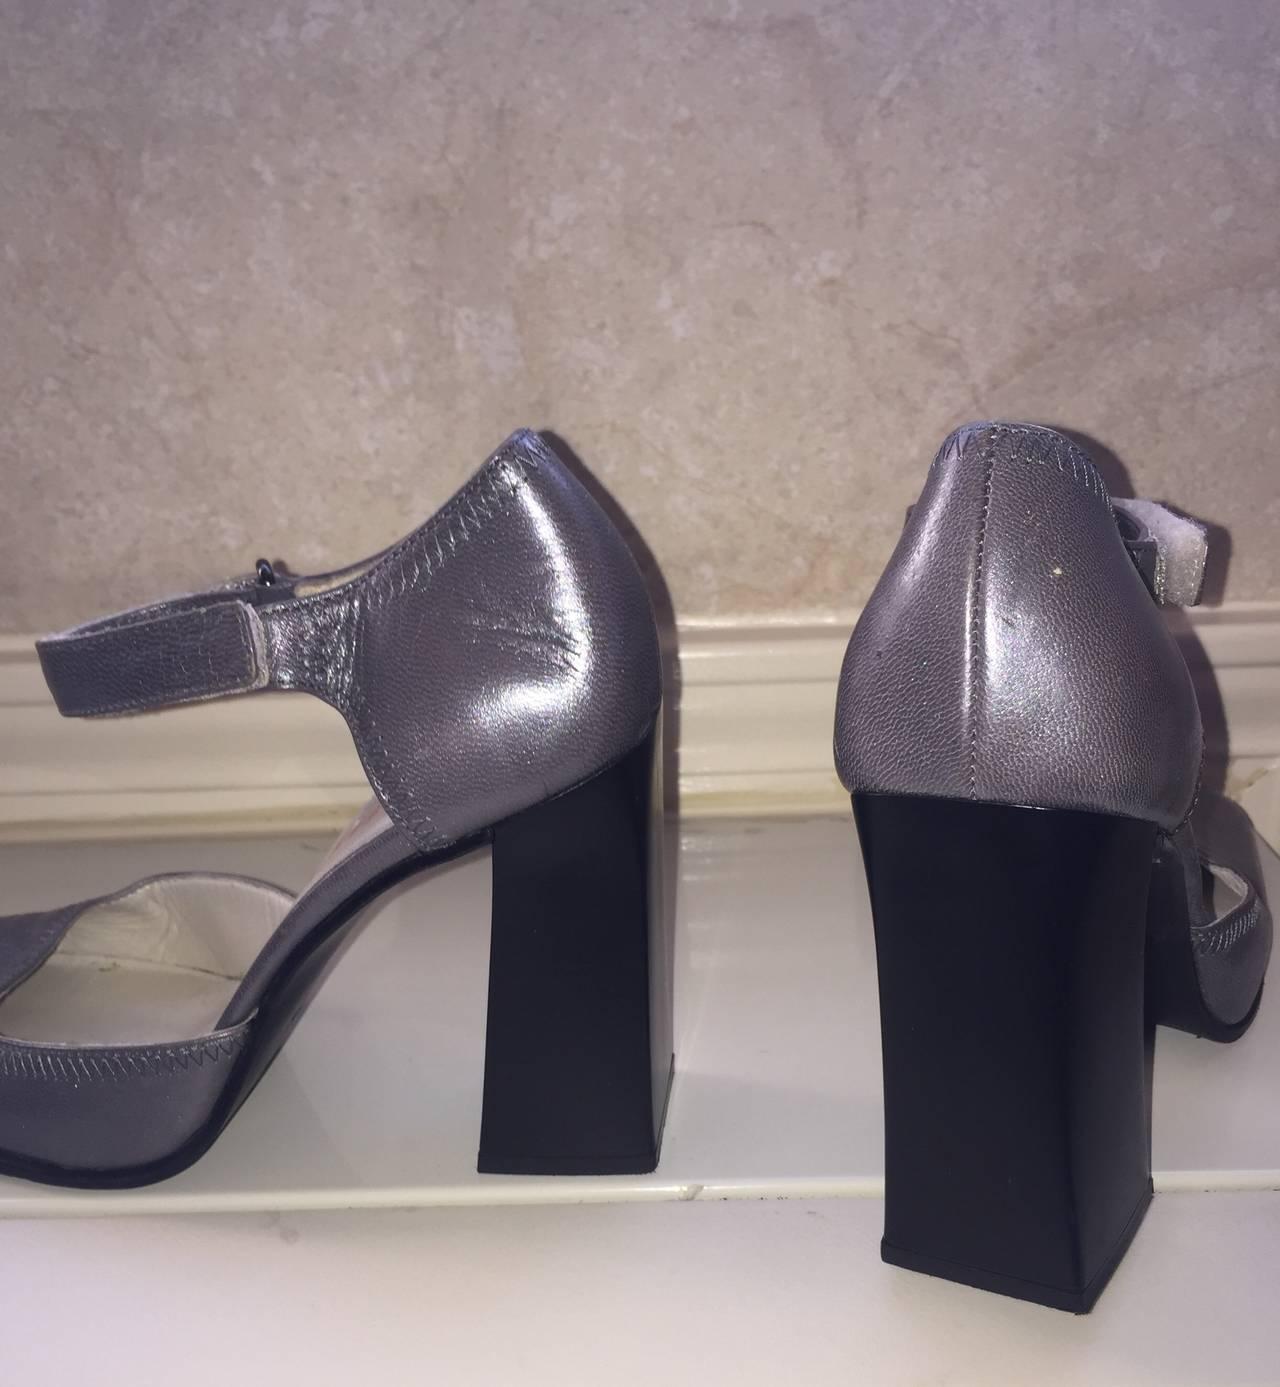 Rare 1990s Vintage Miu Miu ' Architectural ' Gunmetal Block Heels / Shoes 36.5 5